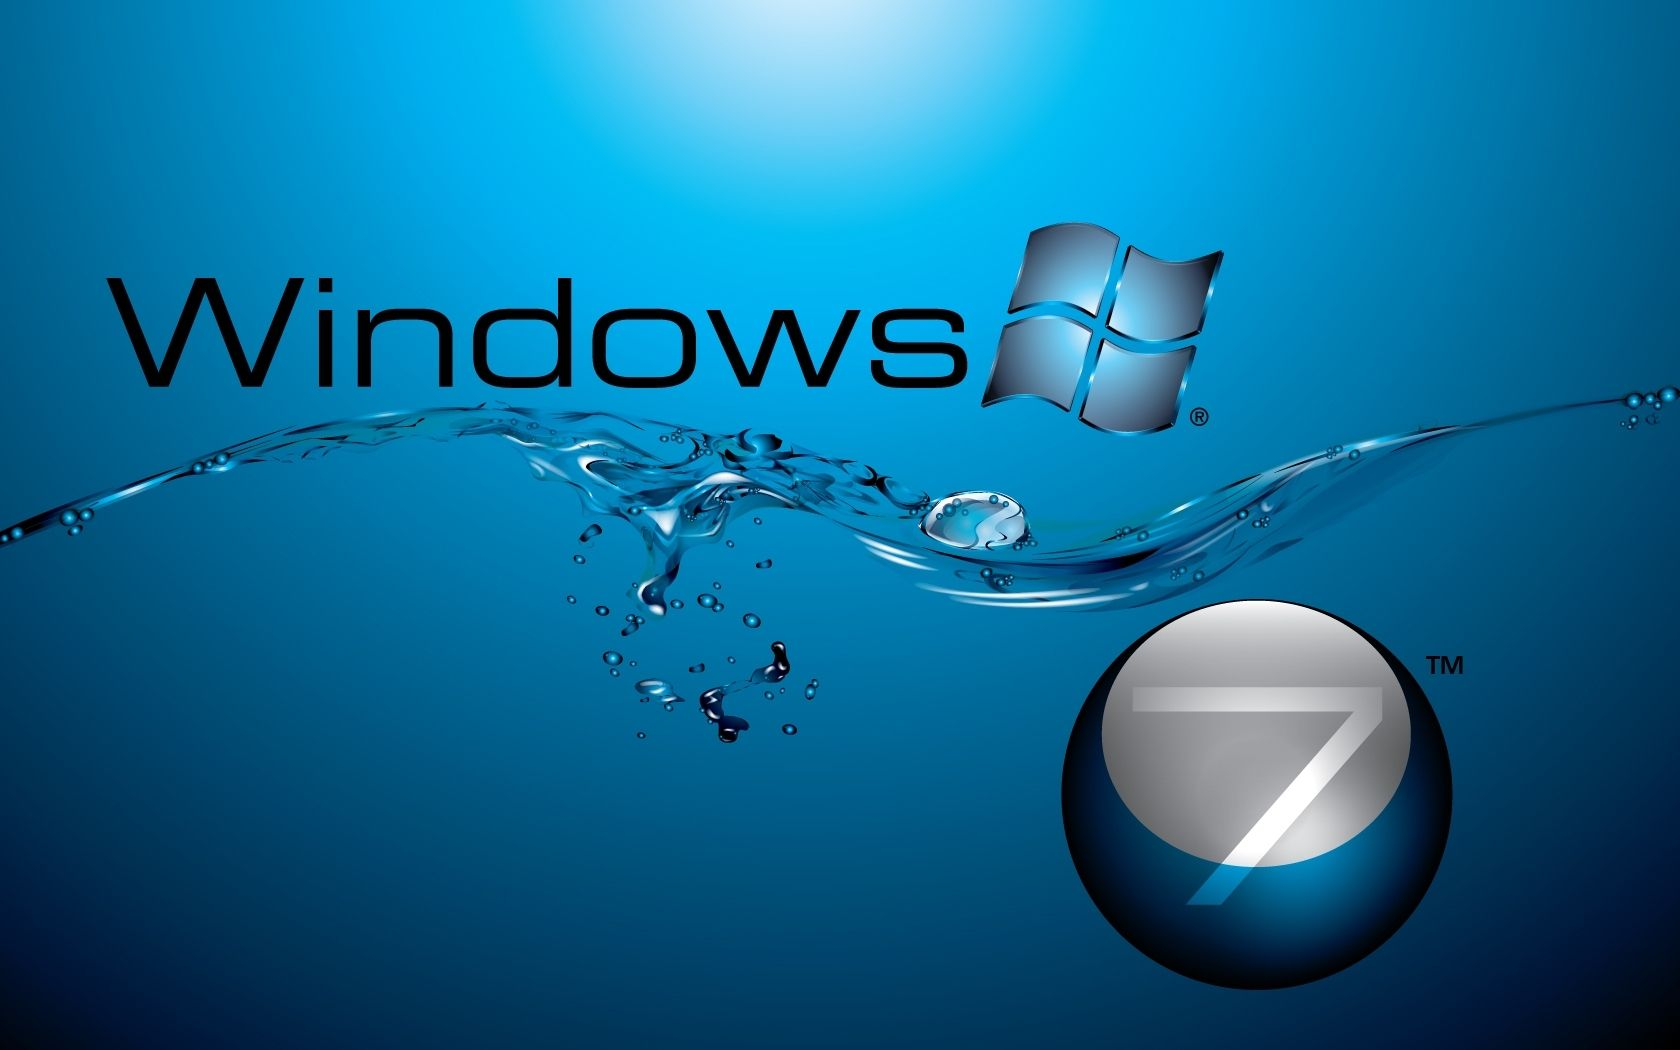 10 Most Popular Free Wallpaper For Windows 7 Full Hd 1080p For Pc Desktop Windows Wallpaper Wallpaper Pc Windows Desktop Wallpaper